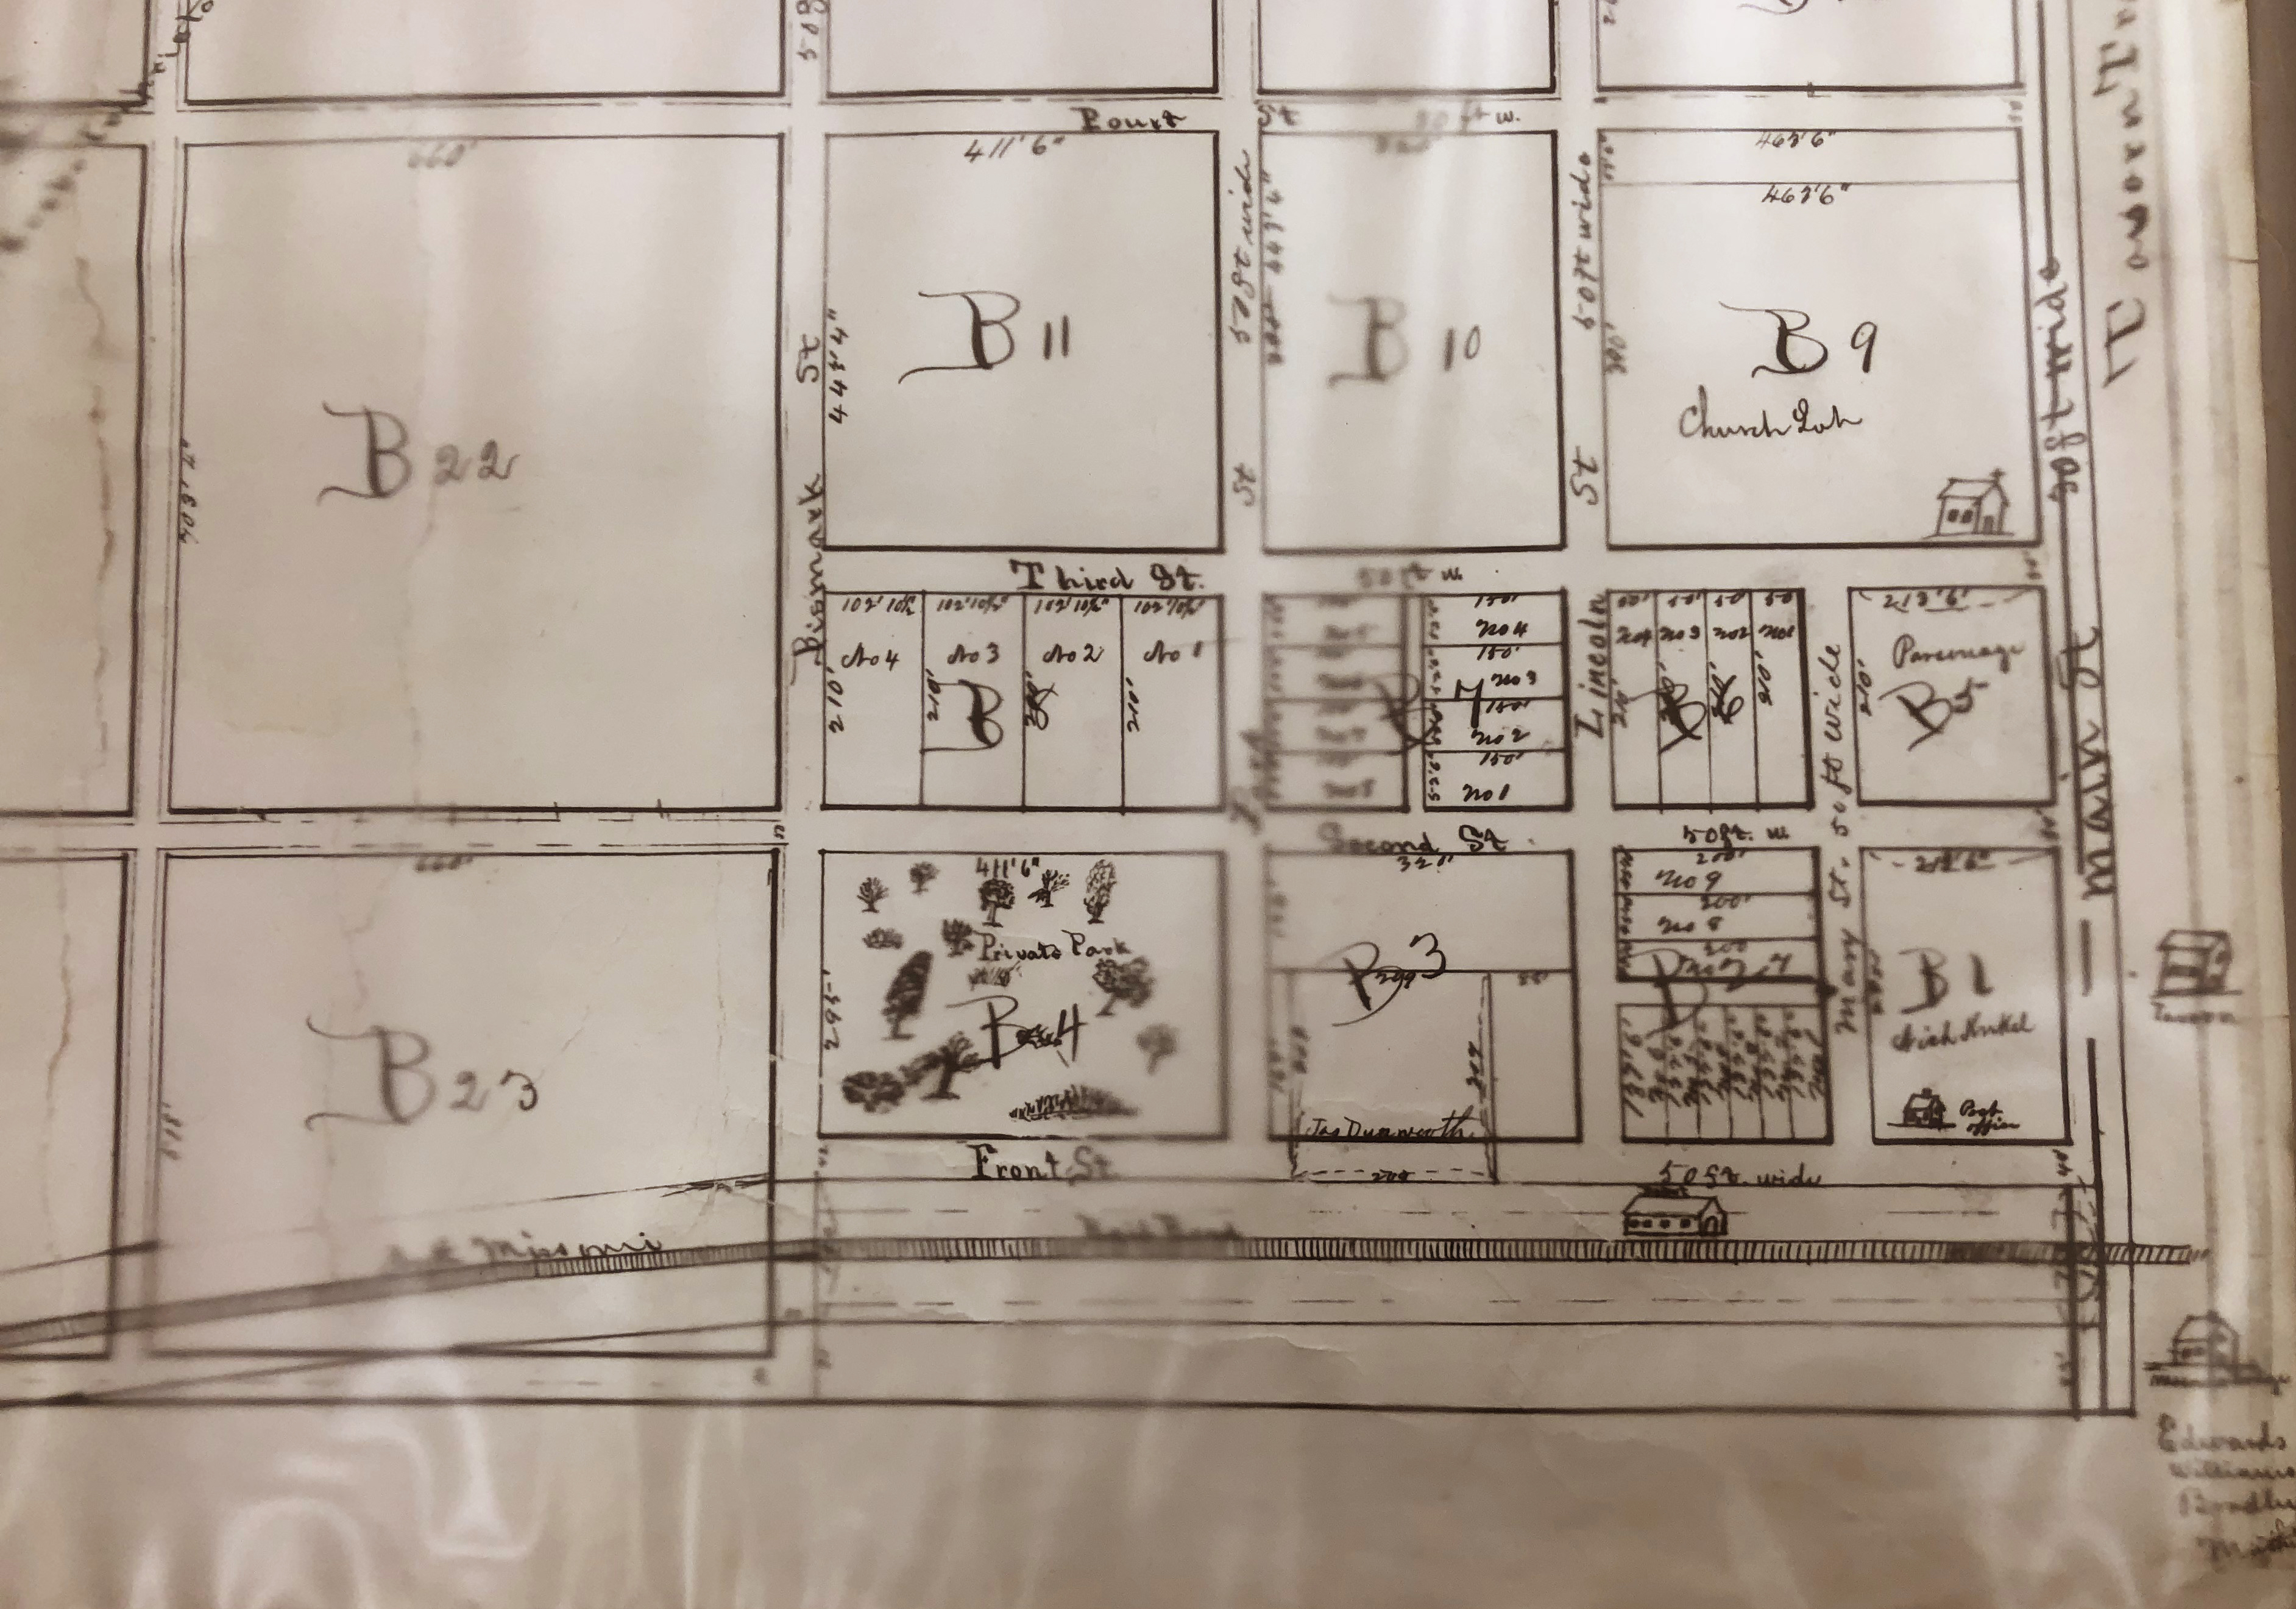 Survey drawn by Arnold Krekel of the original town of O'Fallon, Missouri.